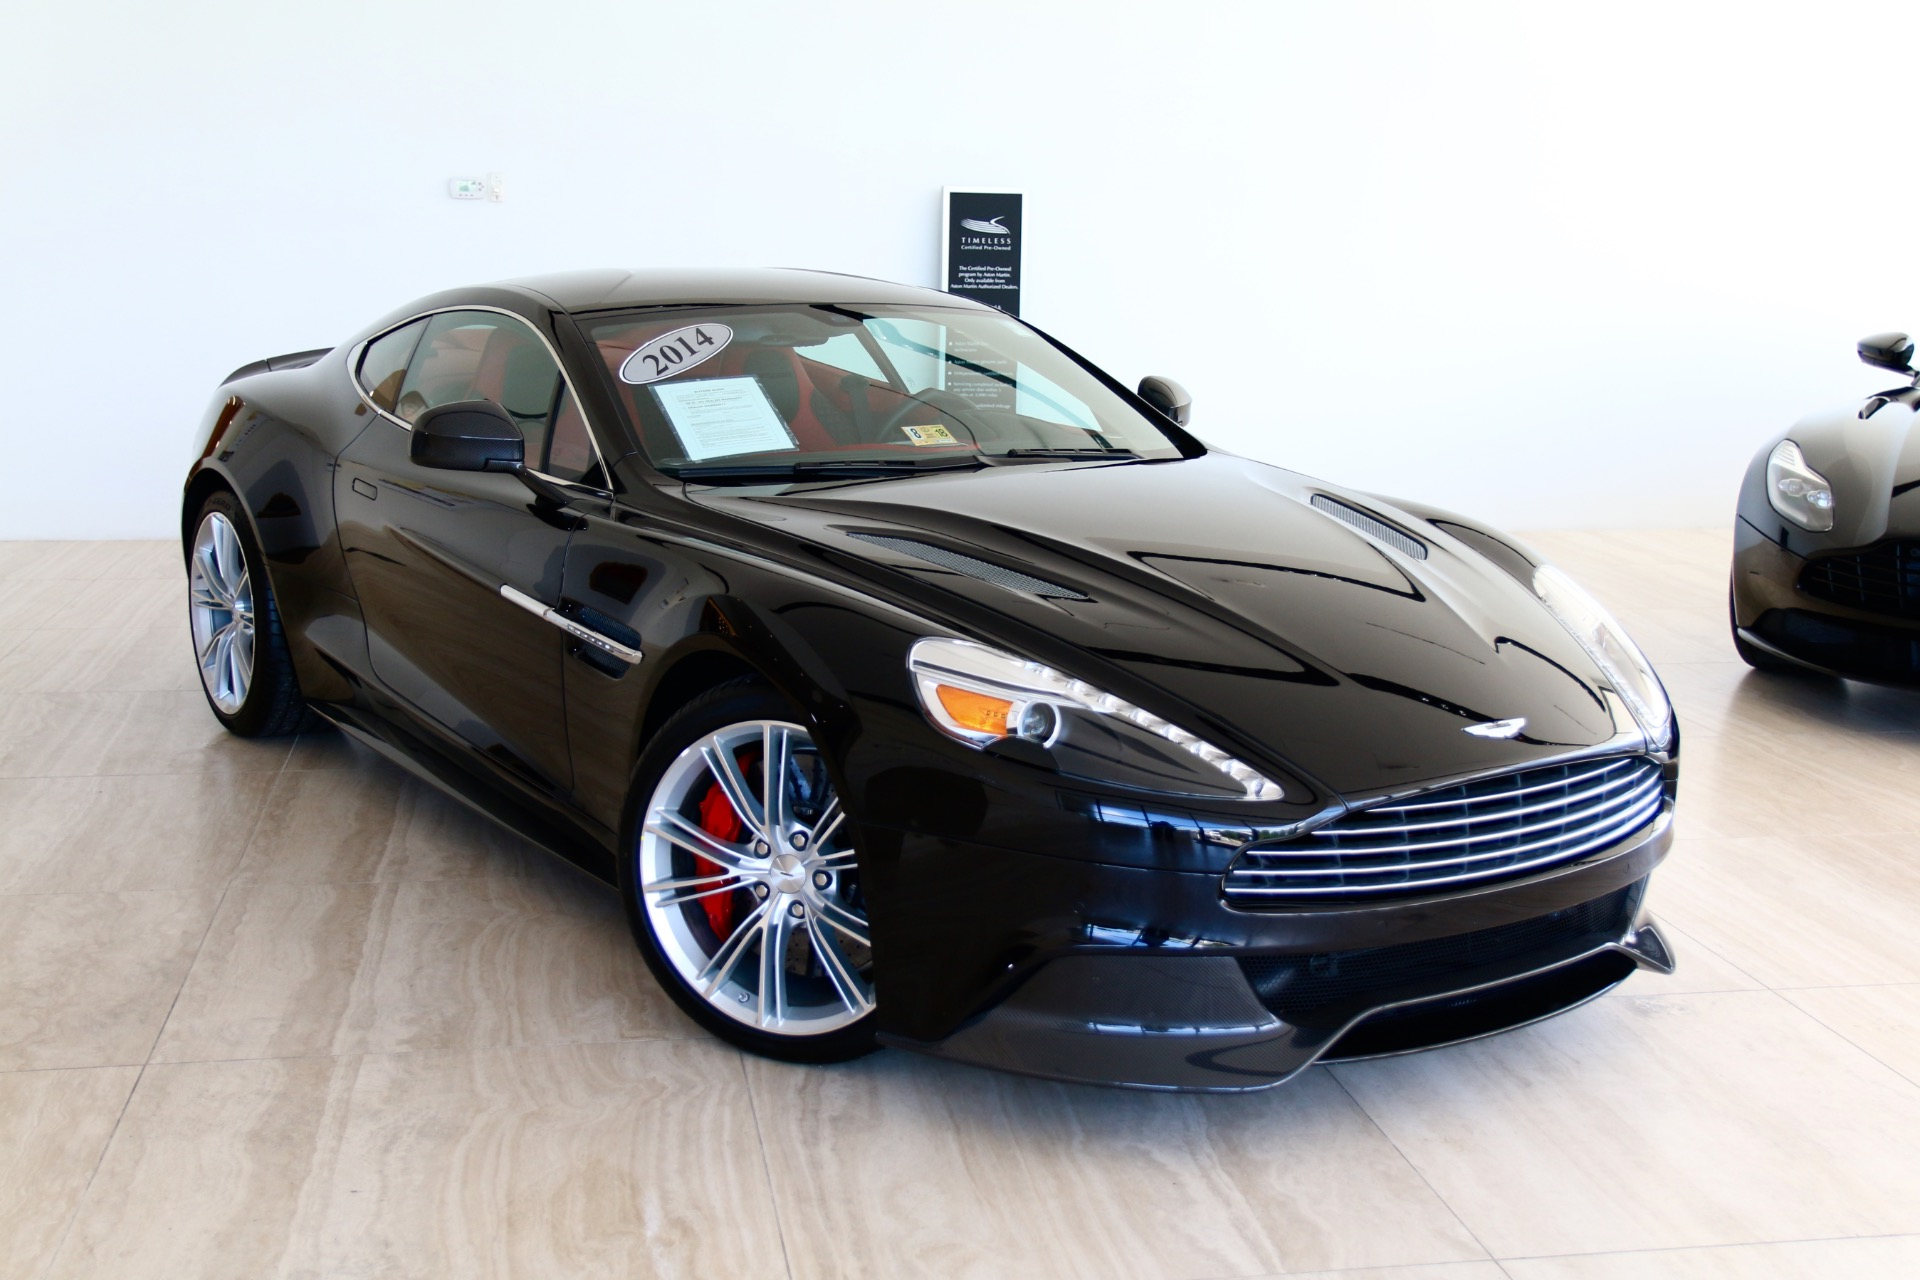 2014 Aston Martin Vanquish Stock 8nj33902b For Sale Near Vienna Va Va Aston Martin Dealer